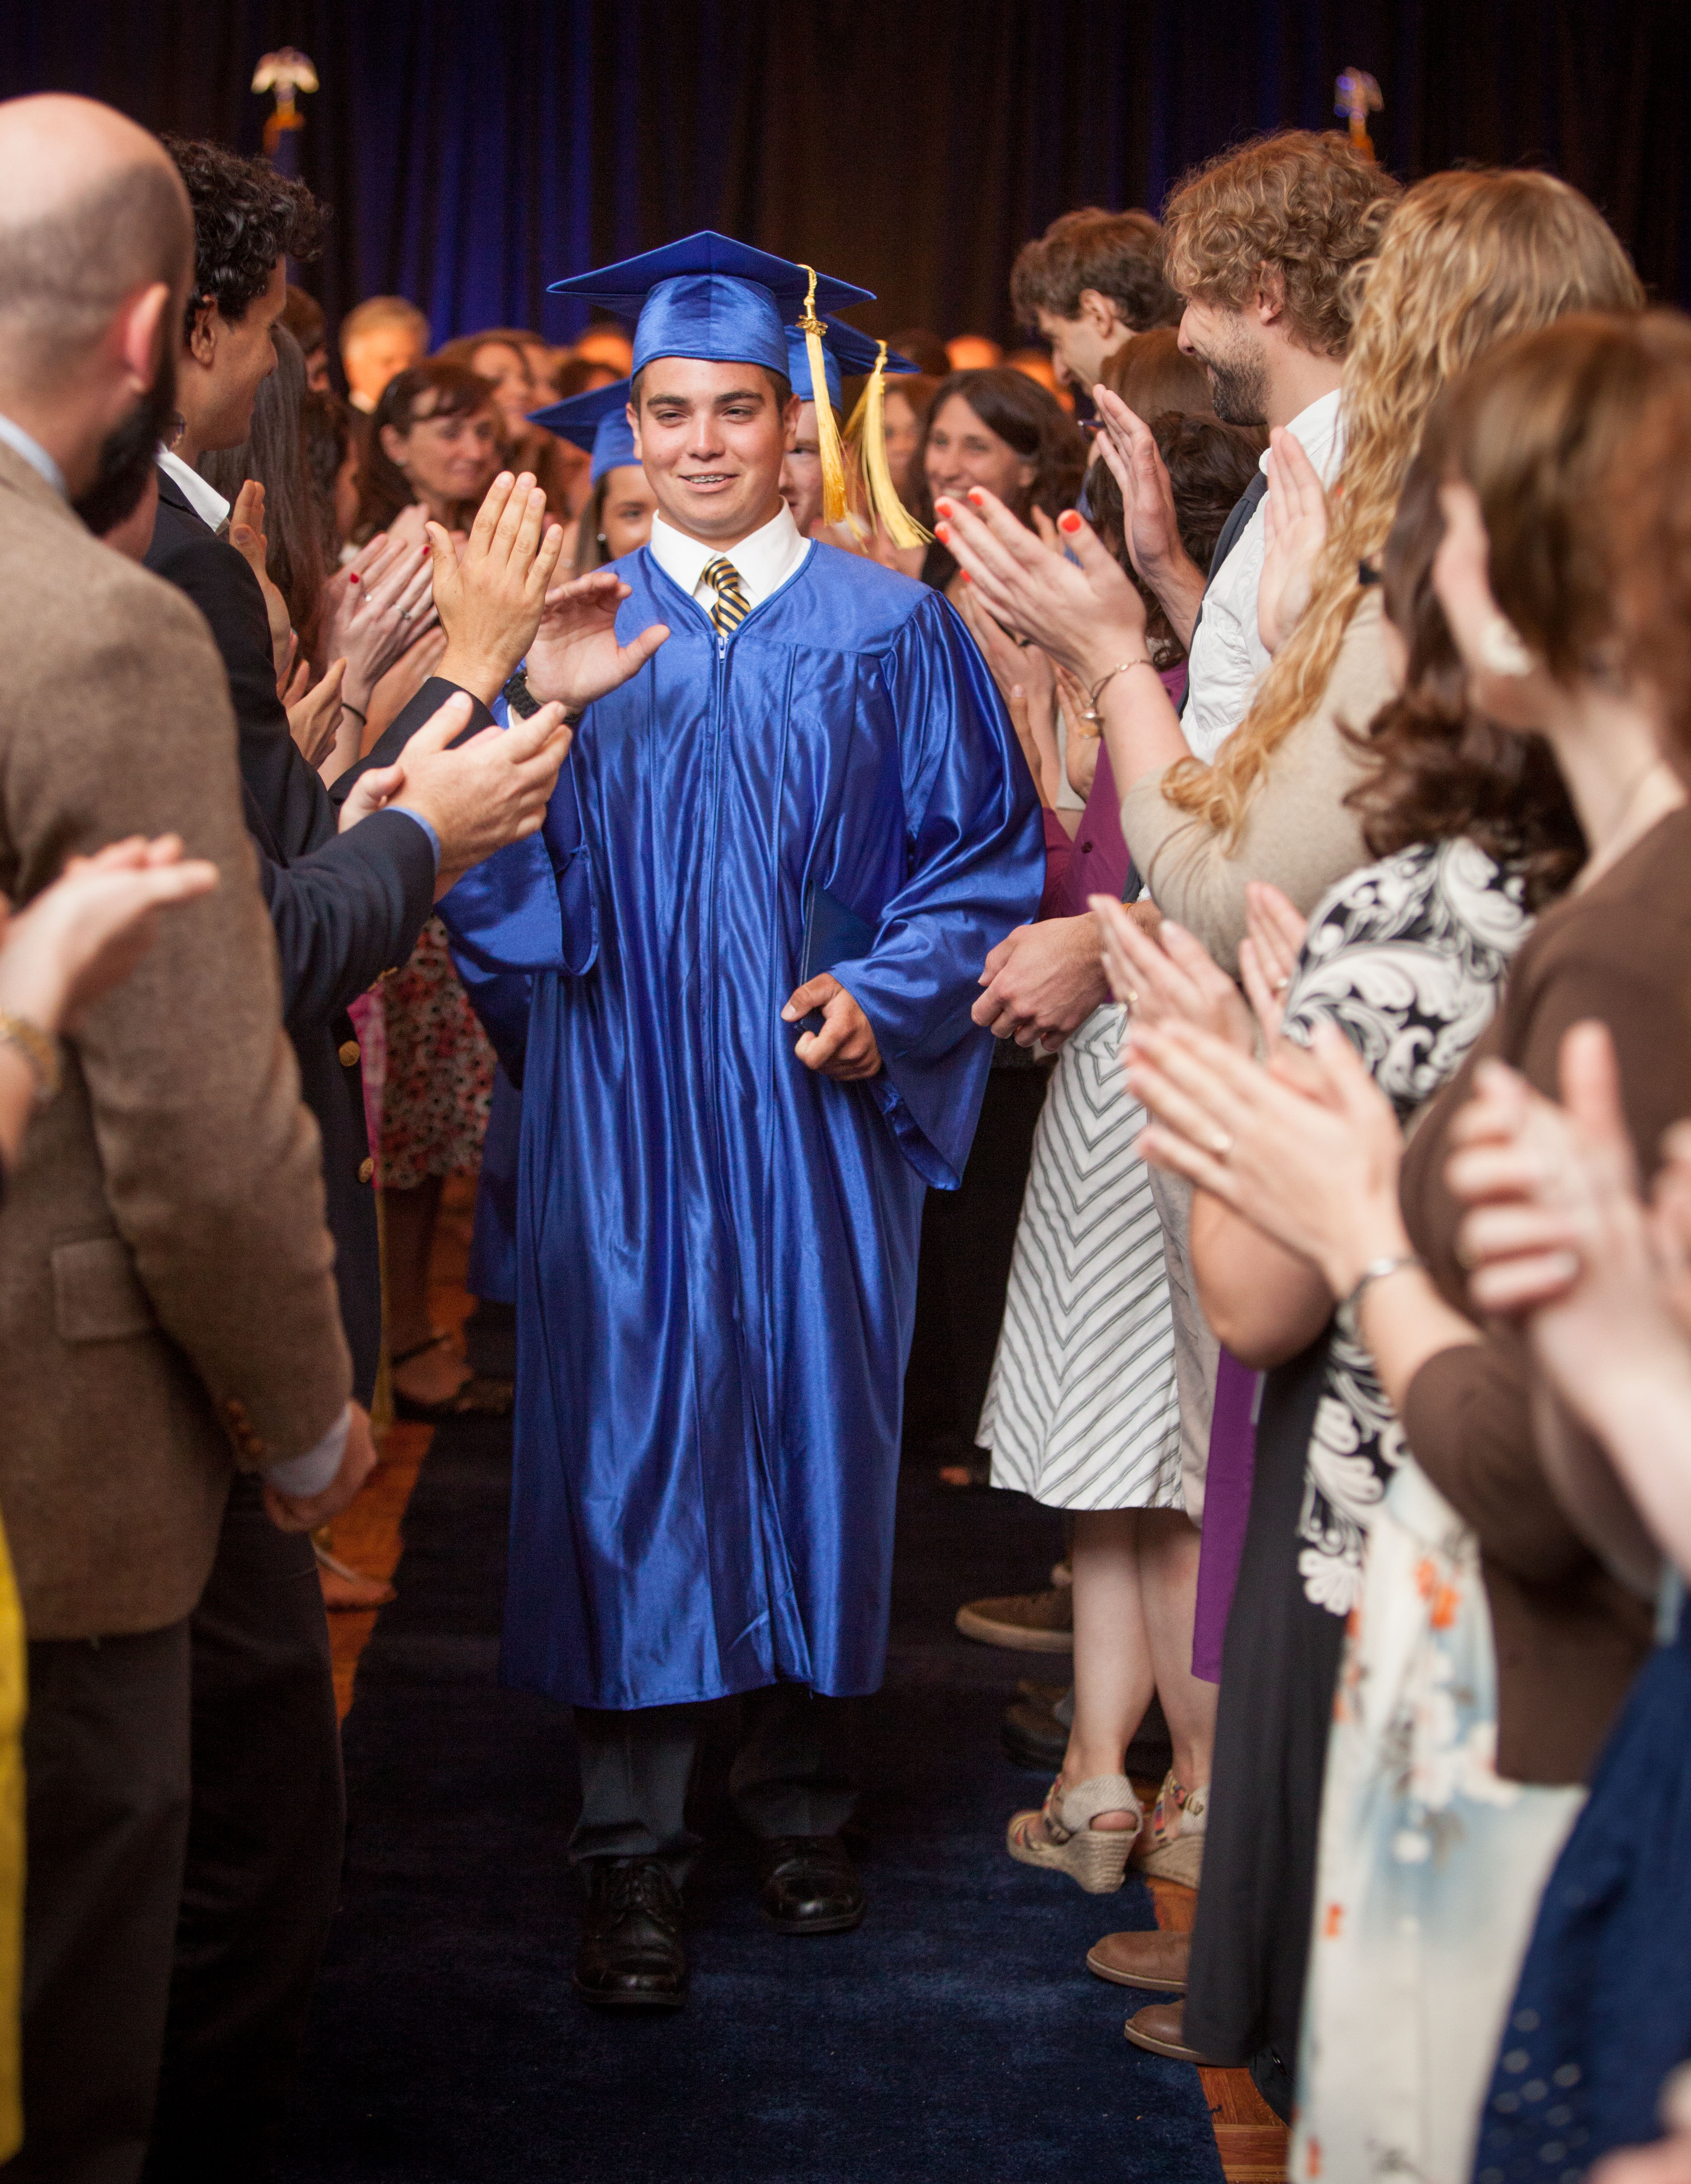 High School Graduation Requirements, rigorous or generous?